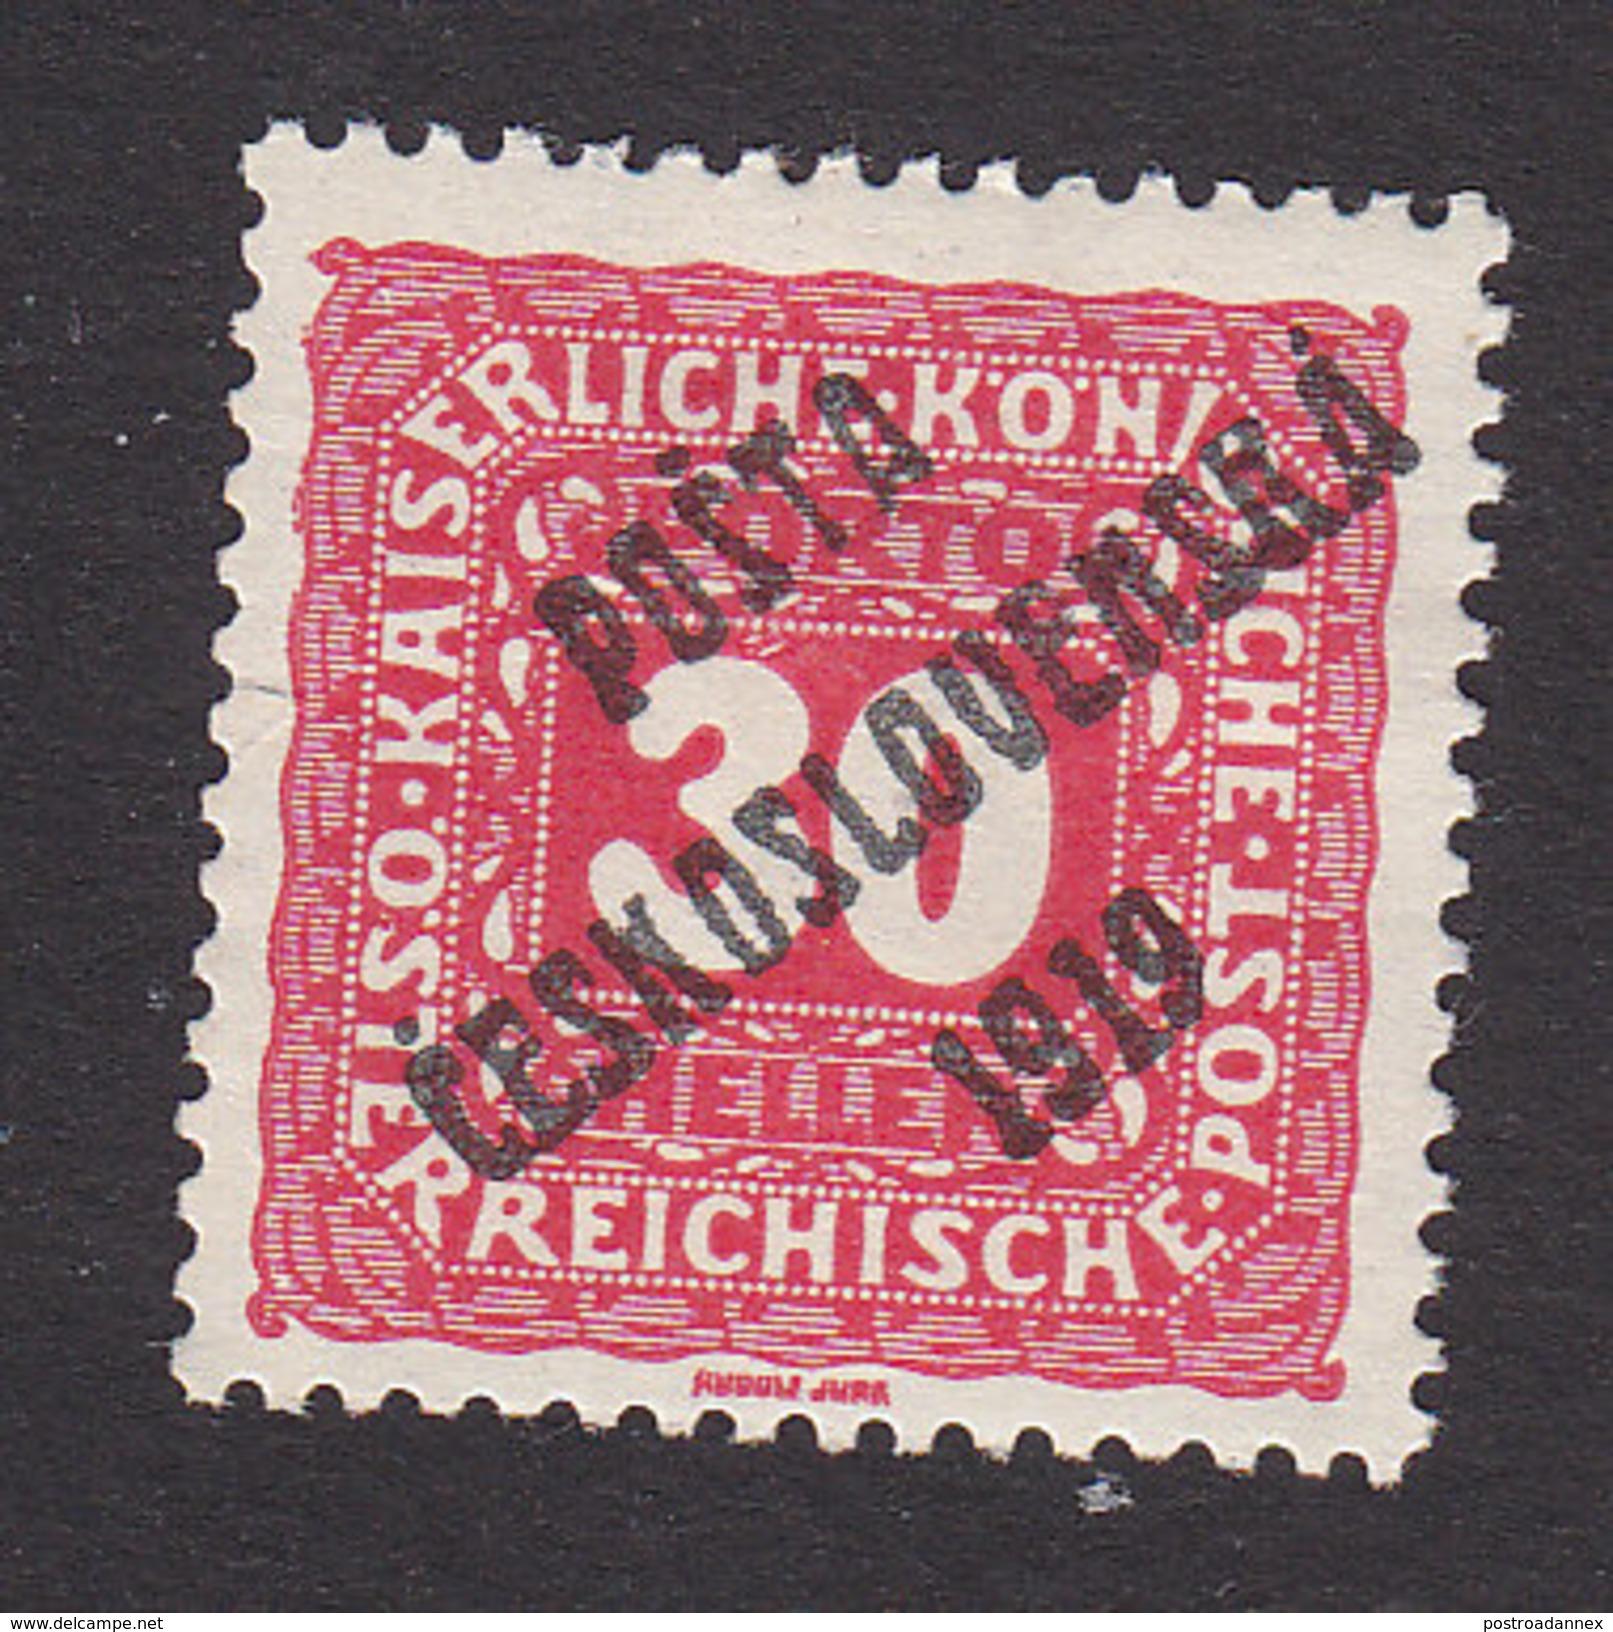 Czechoslovakia, Scott #B52, Mint Hinged, Austrian Stamp Overprinted, Issued 1919 - Unused Stamps